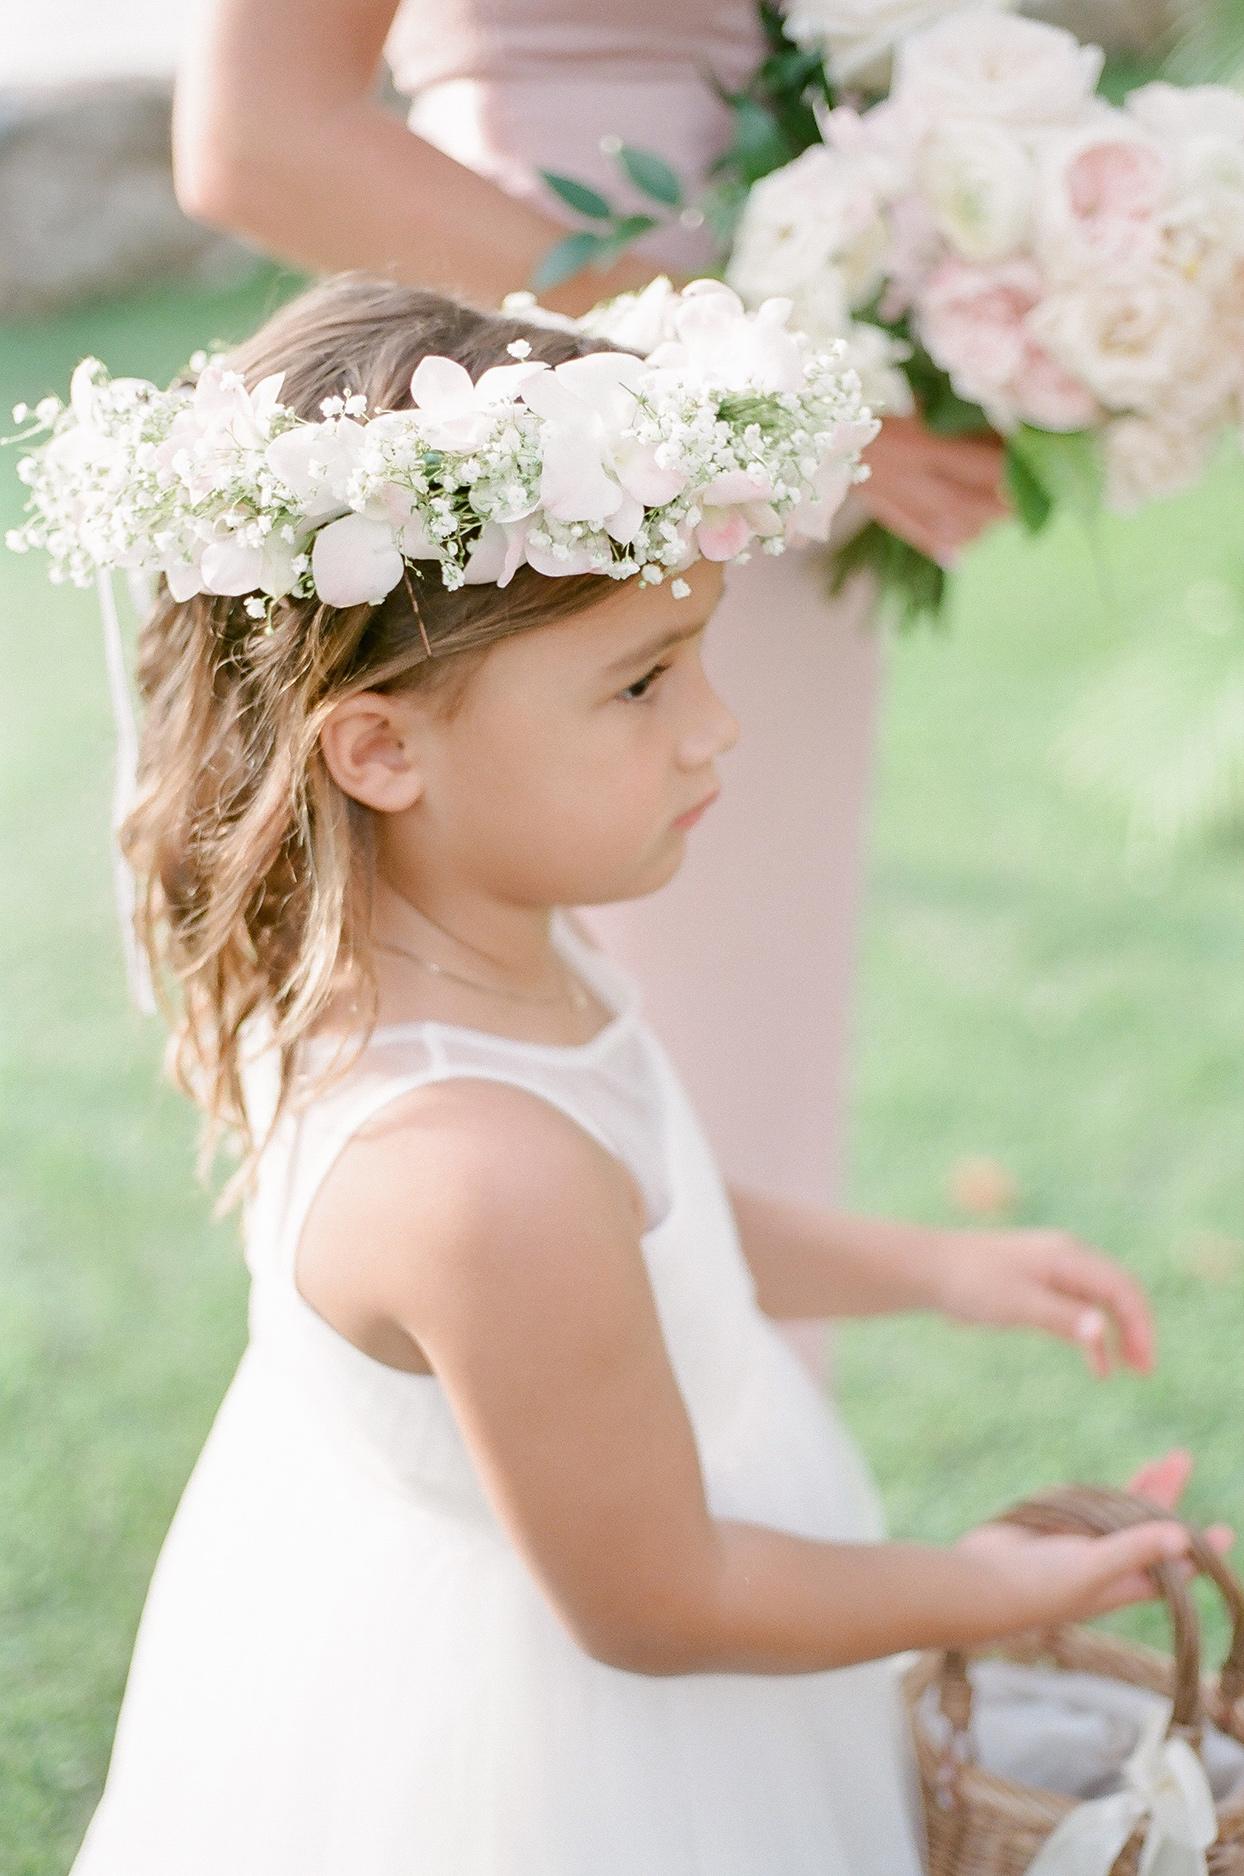 vanessa nathan wedding flower girl wearing white wreath in hair